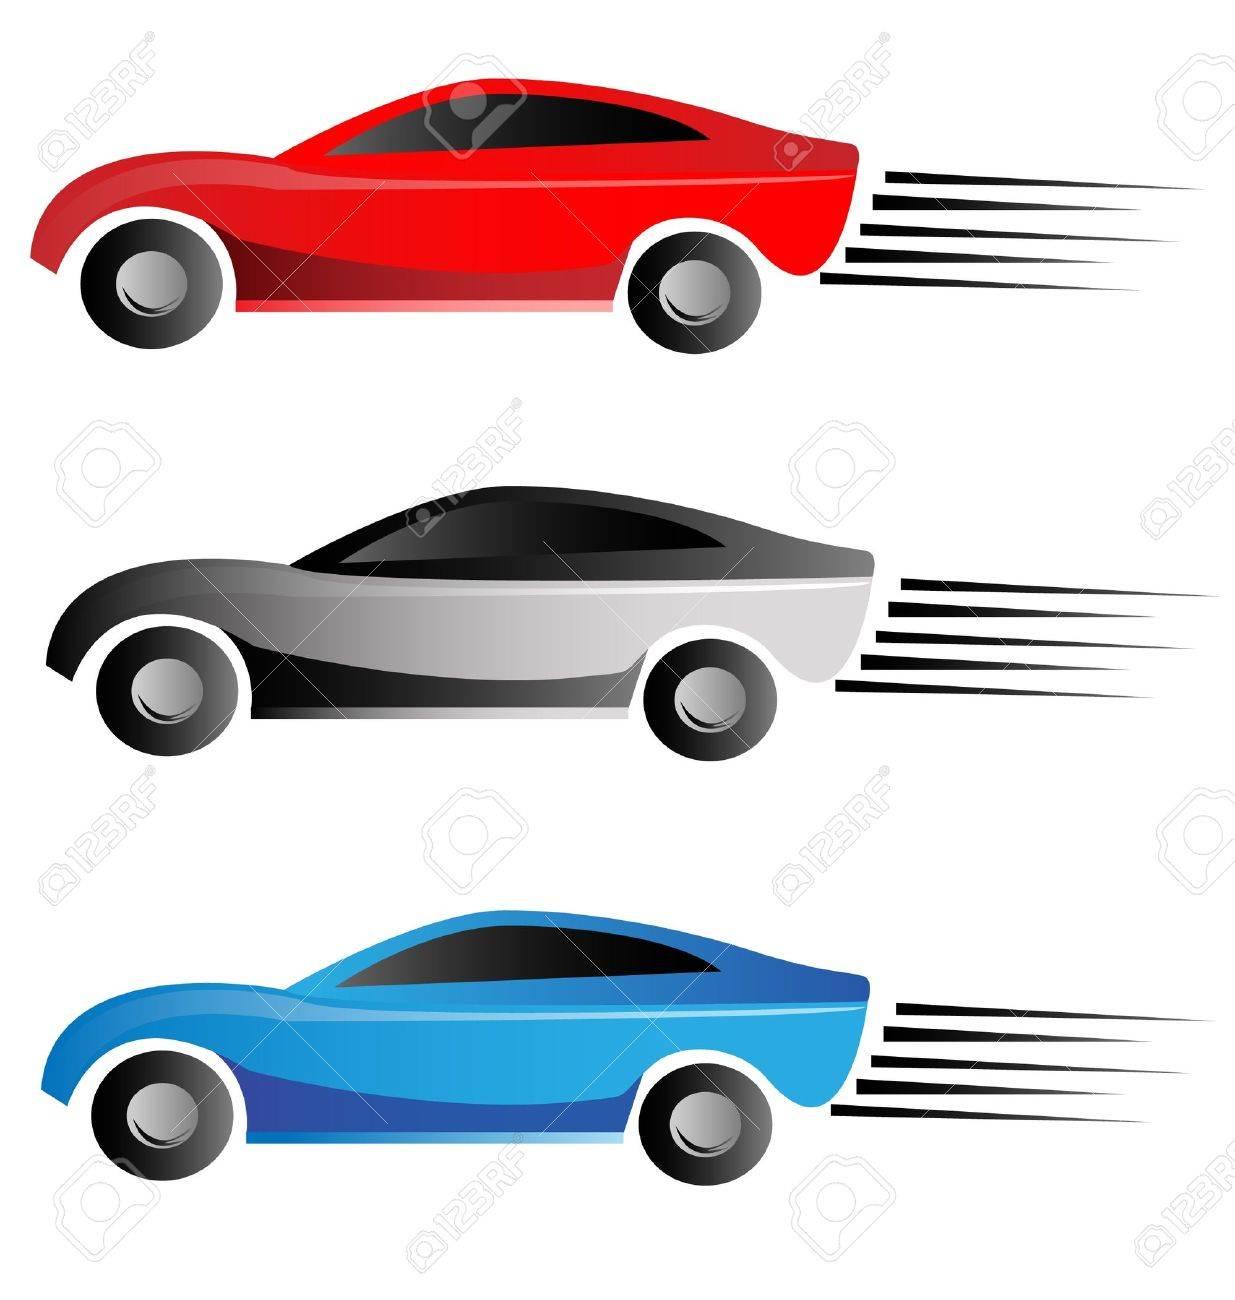 Racing Cars Logo Royalty Free Cliparts Vectors And Stock